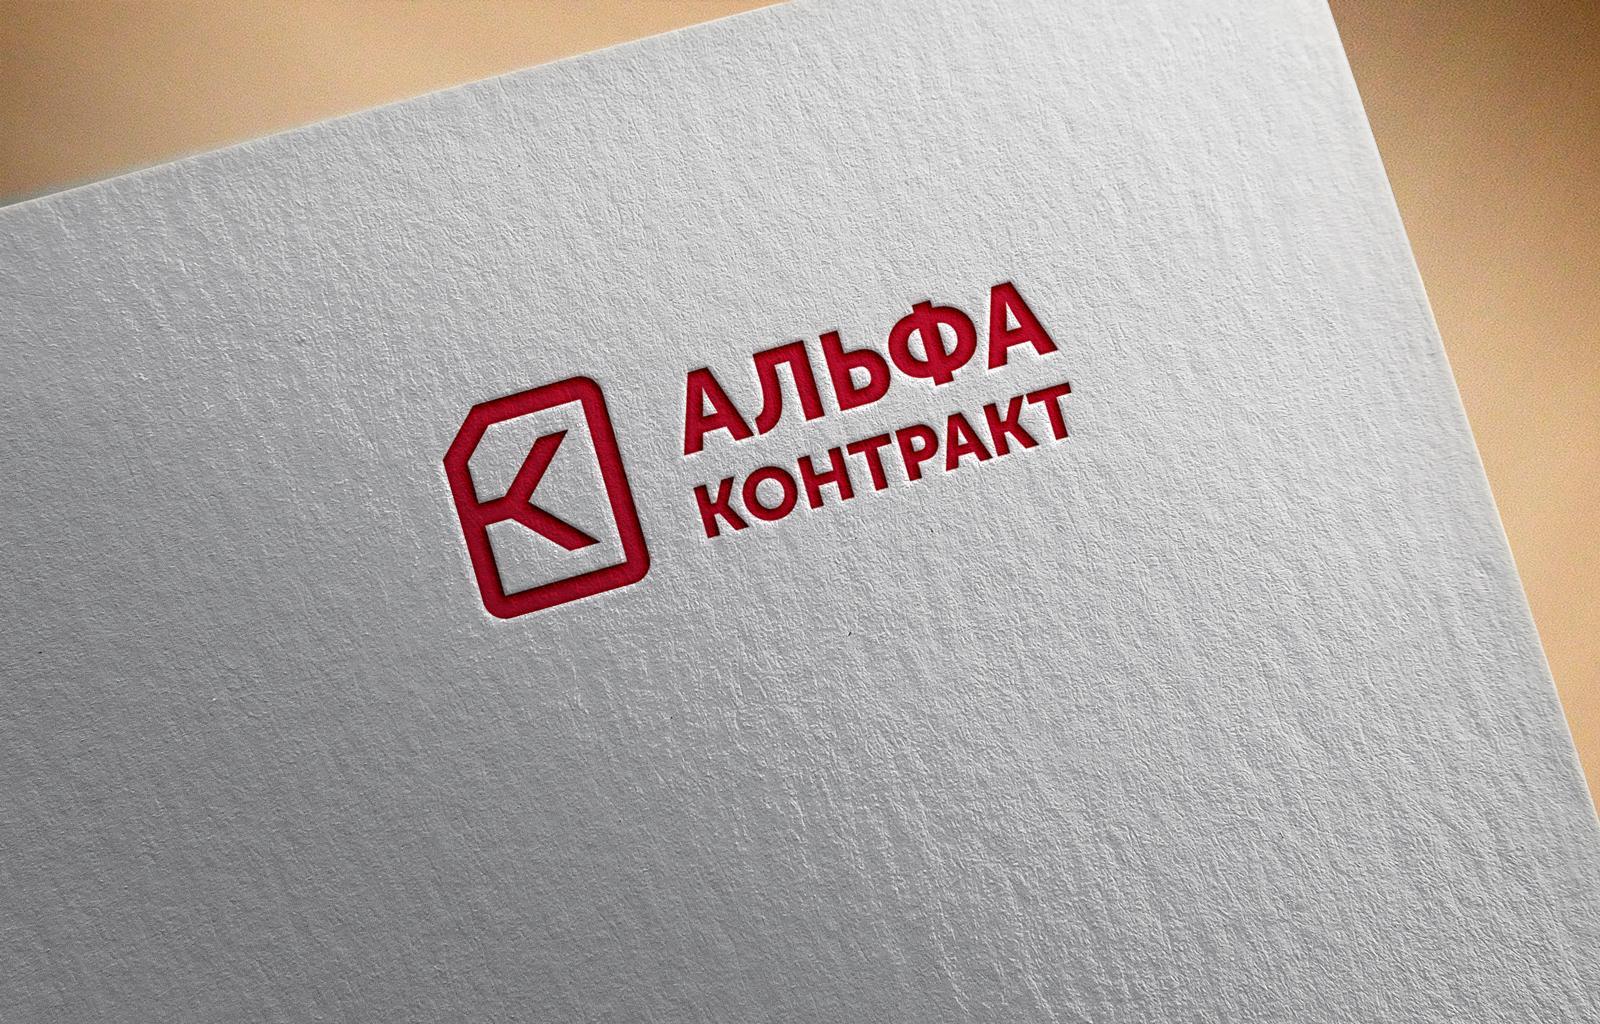 Дизайнер для разработки логотипа компании фото f_9365bfe1a368336f.jpg